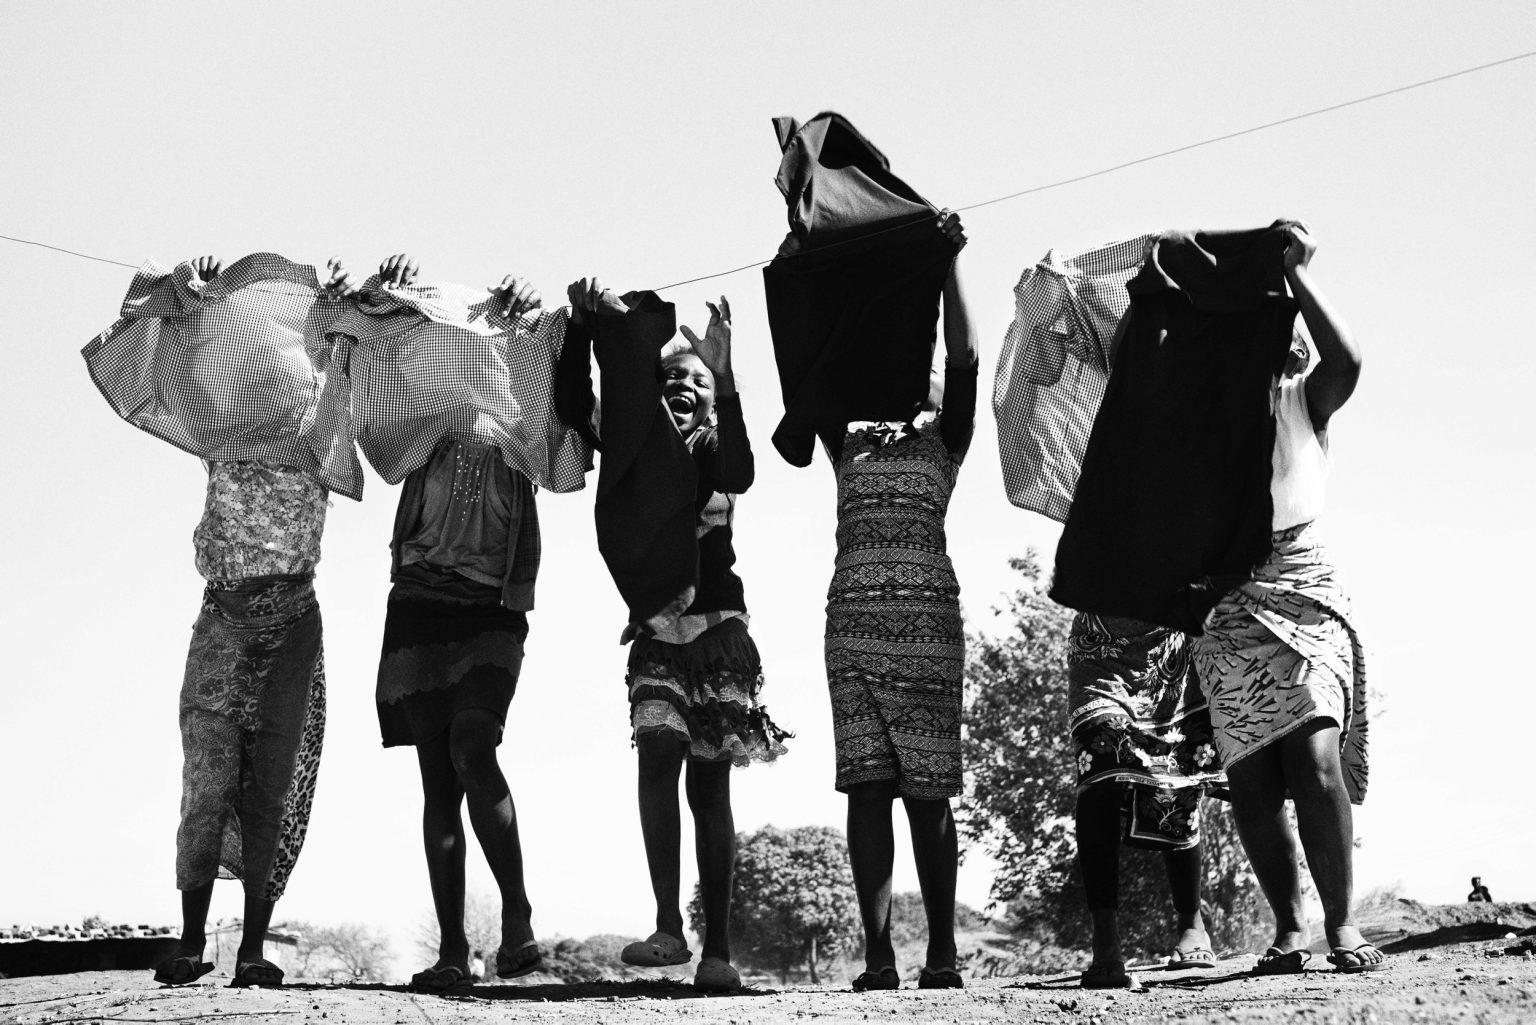 The girls from Loniedzani hang out their school uniforms. Lusaka, Zambia, 2019